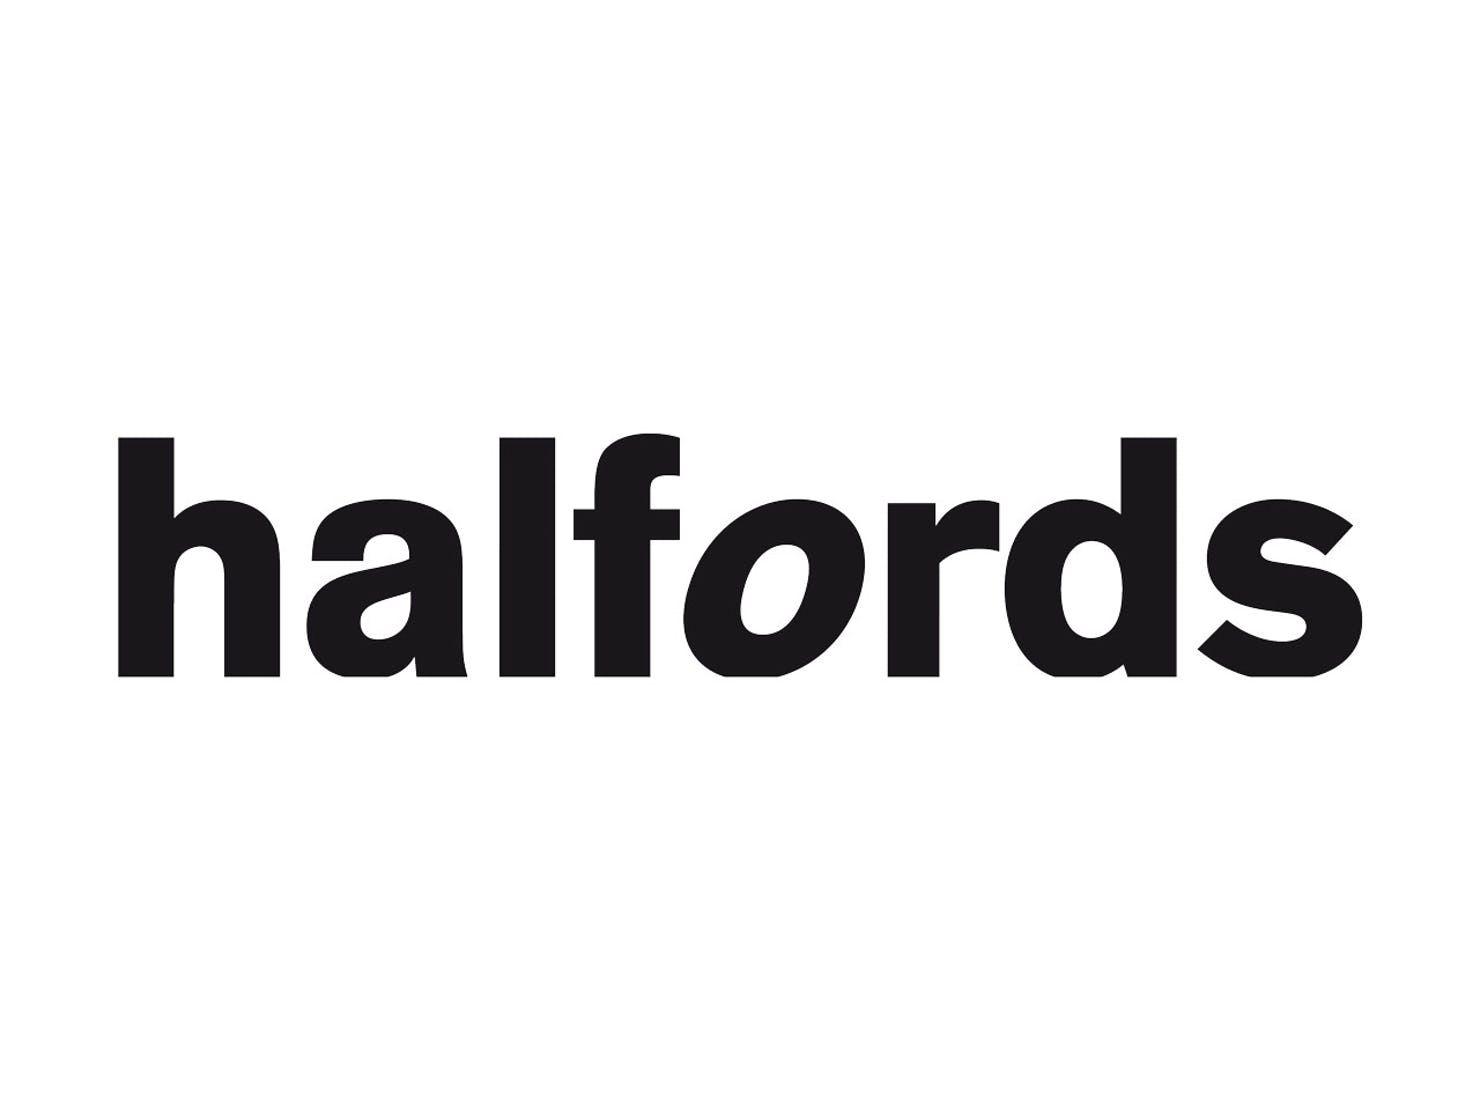 Halfords Pentagram Environmental Graphics Wayfinding Design Visual Identity